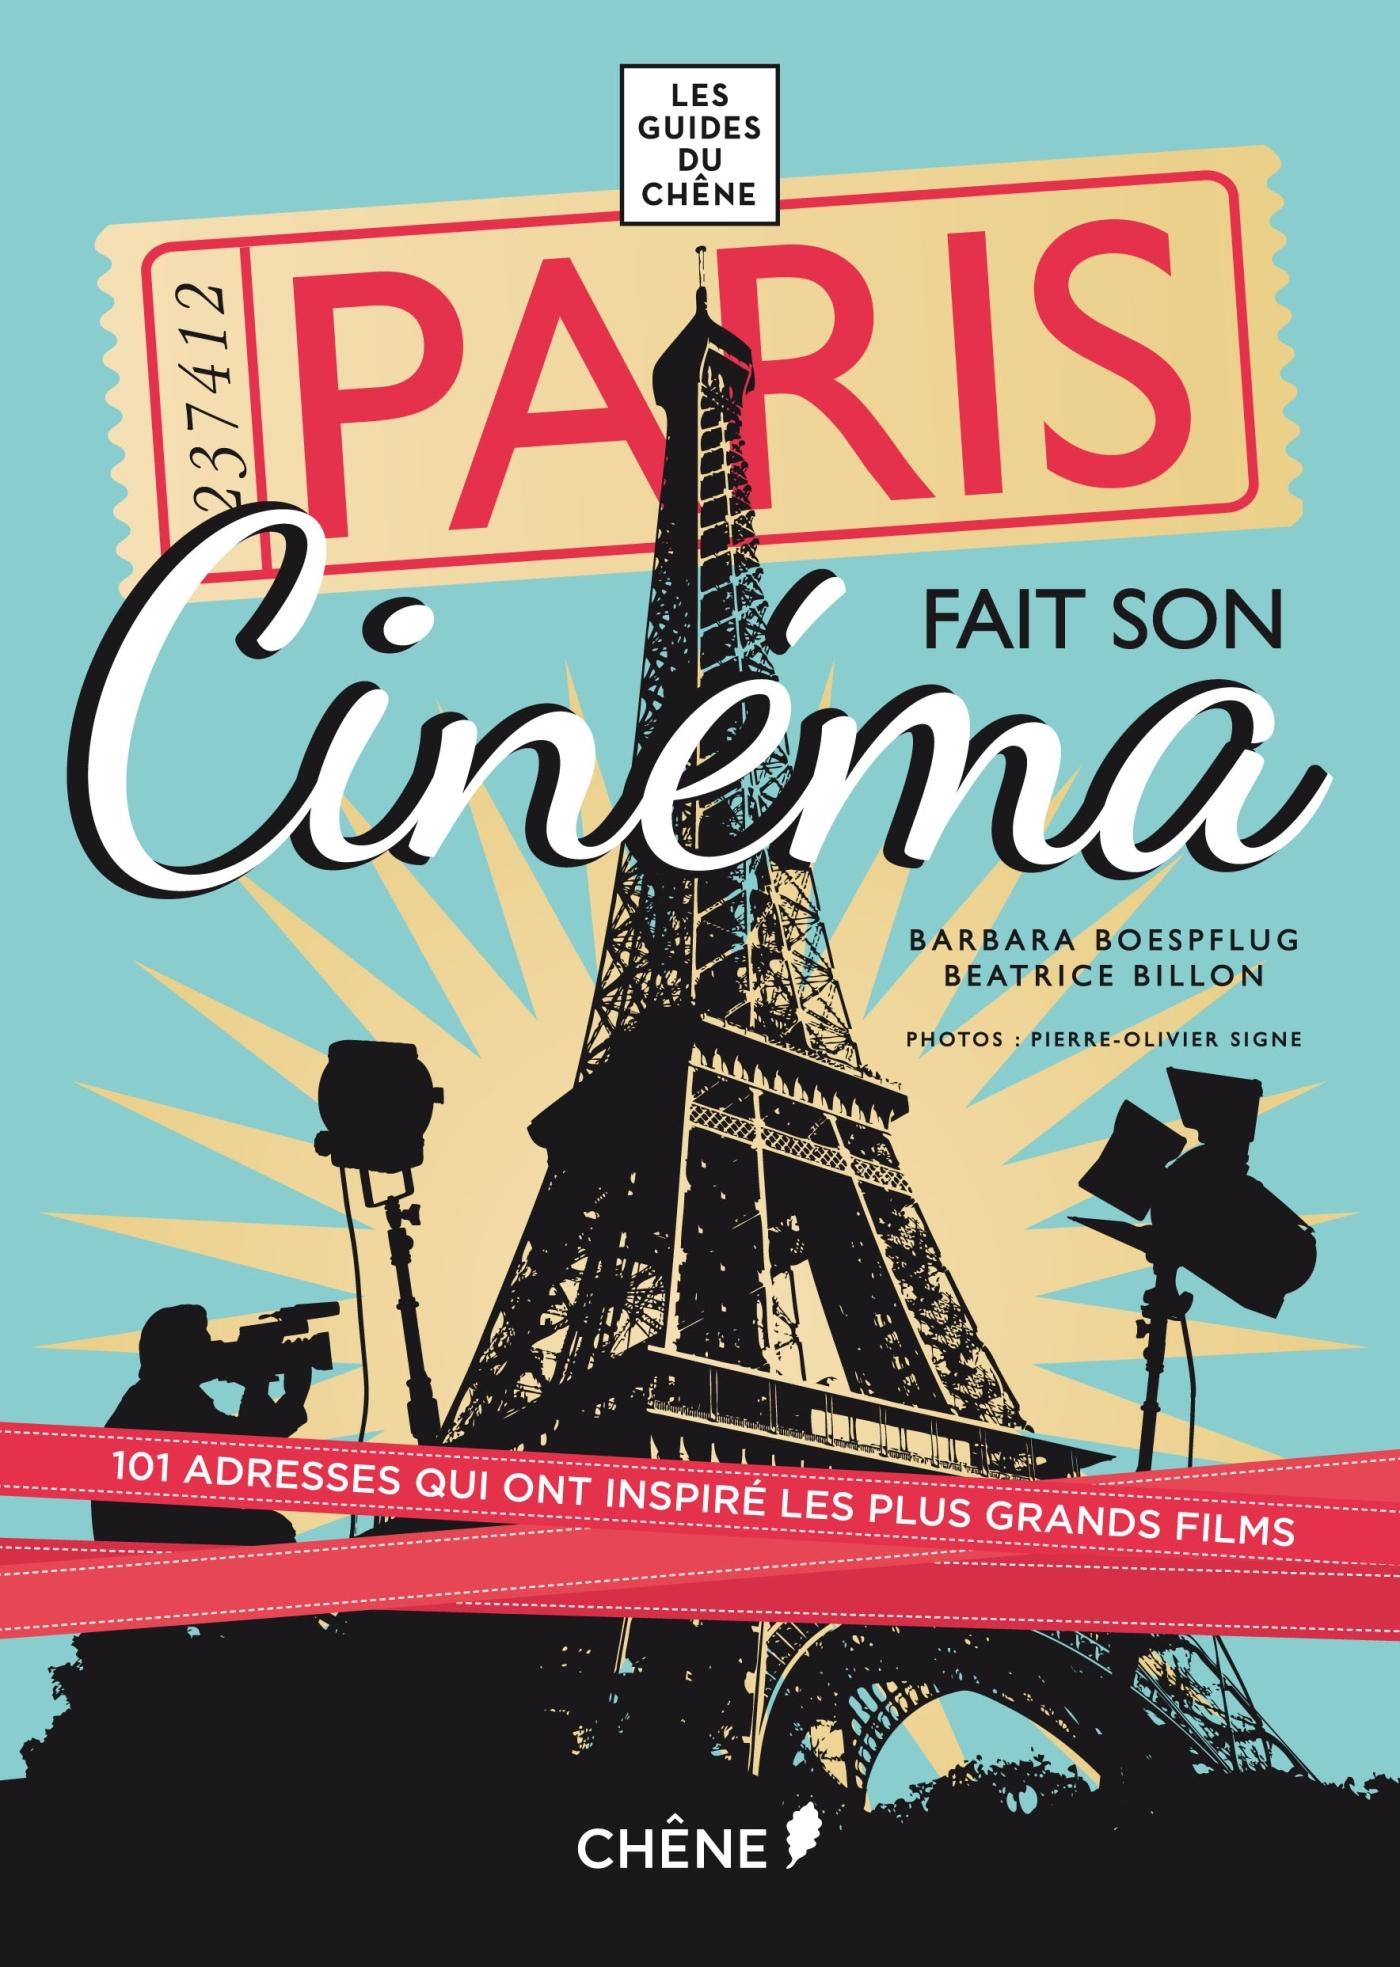 PARIS FAIT SON CINEMA